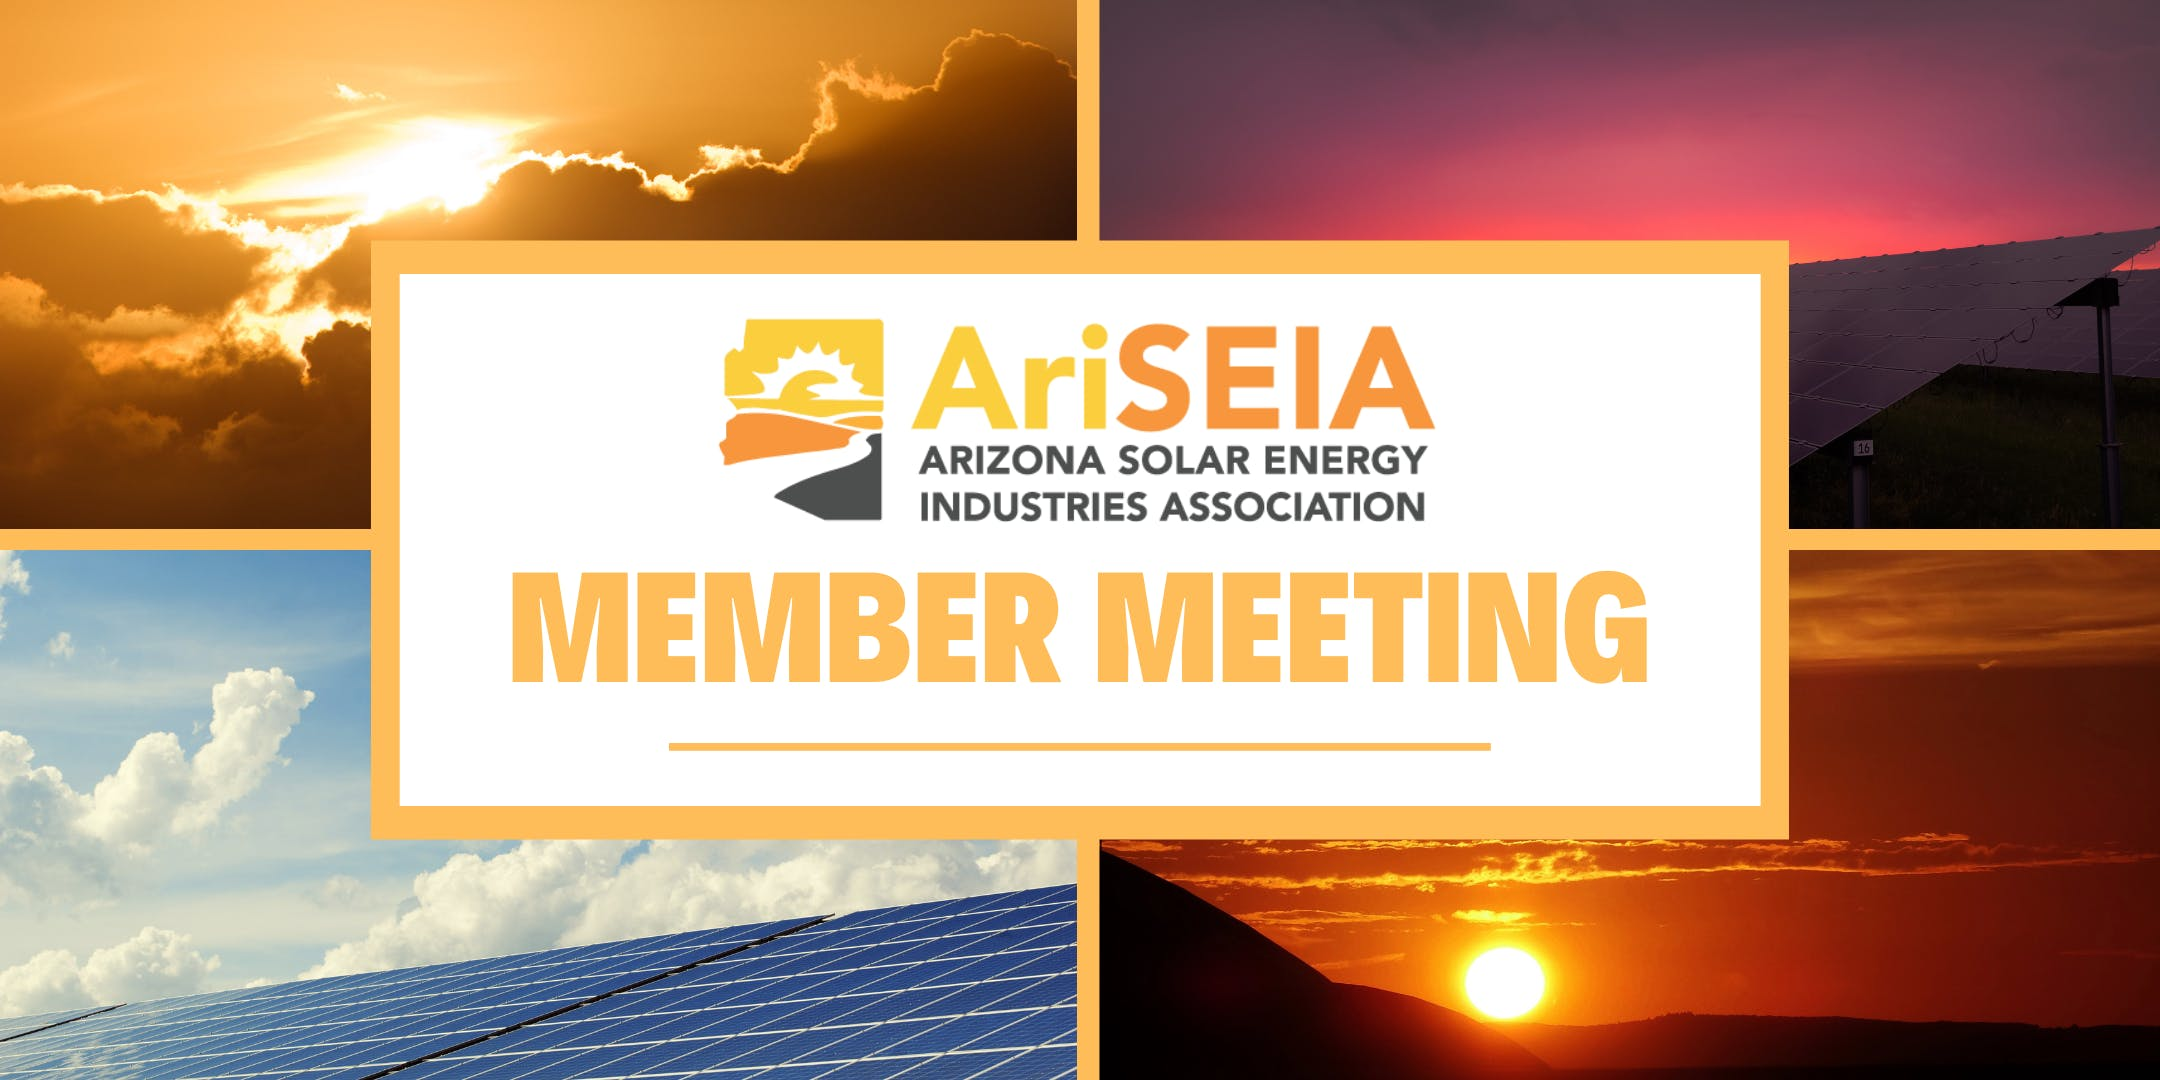 AriSEIA Member Meeting